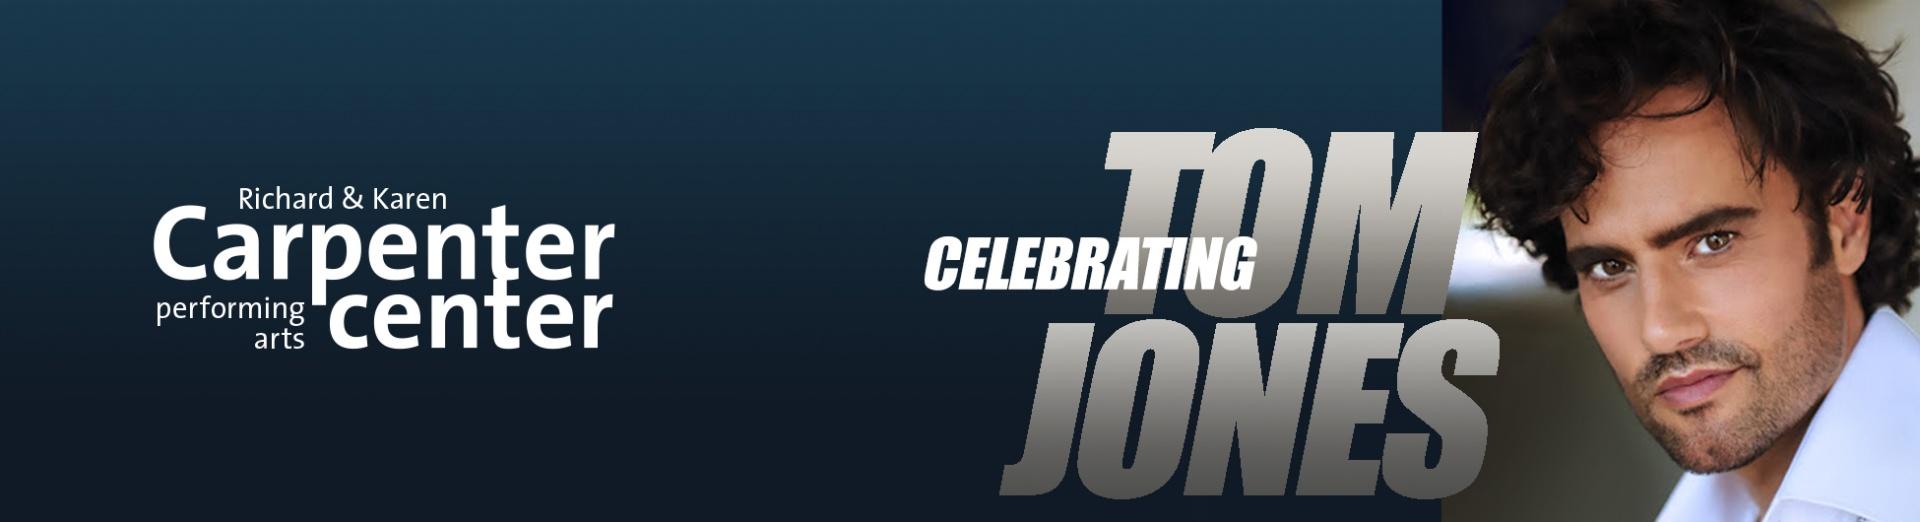 David Burnham Celebrating Tom Jones